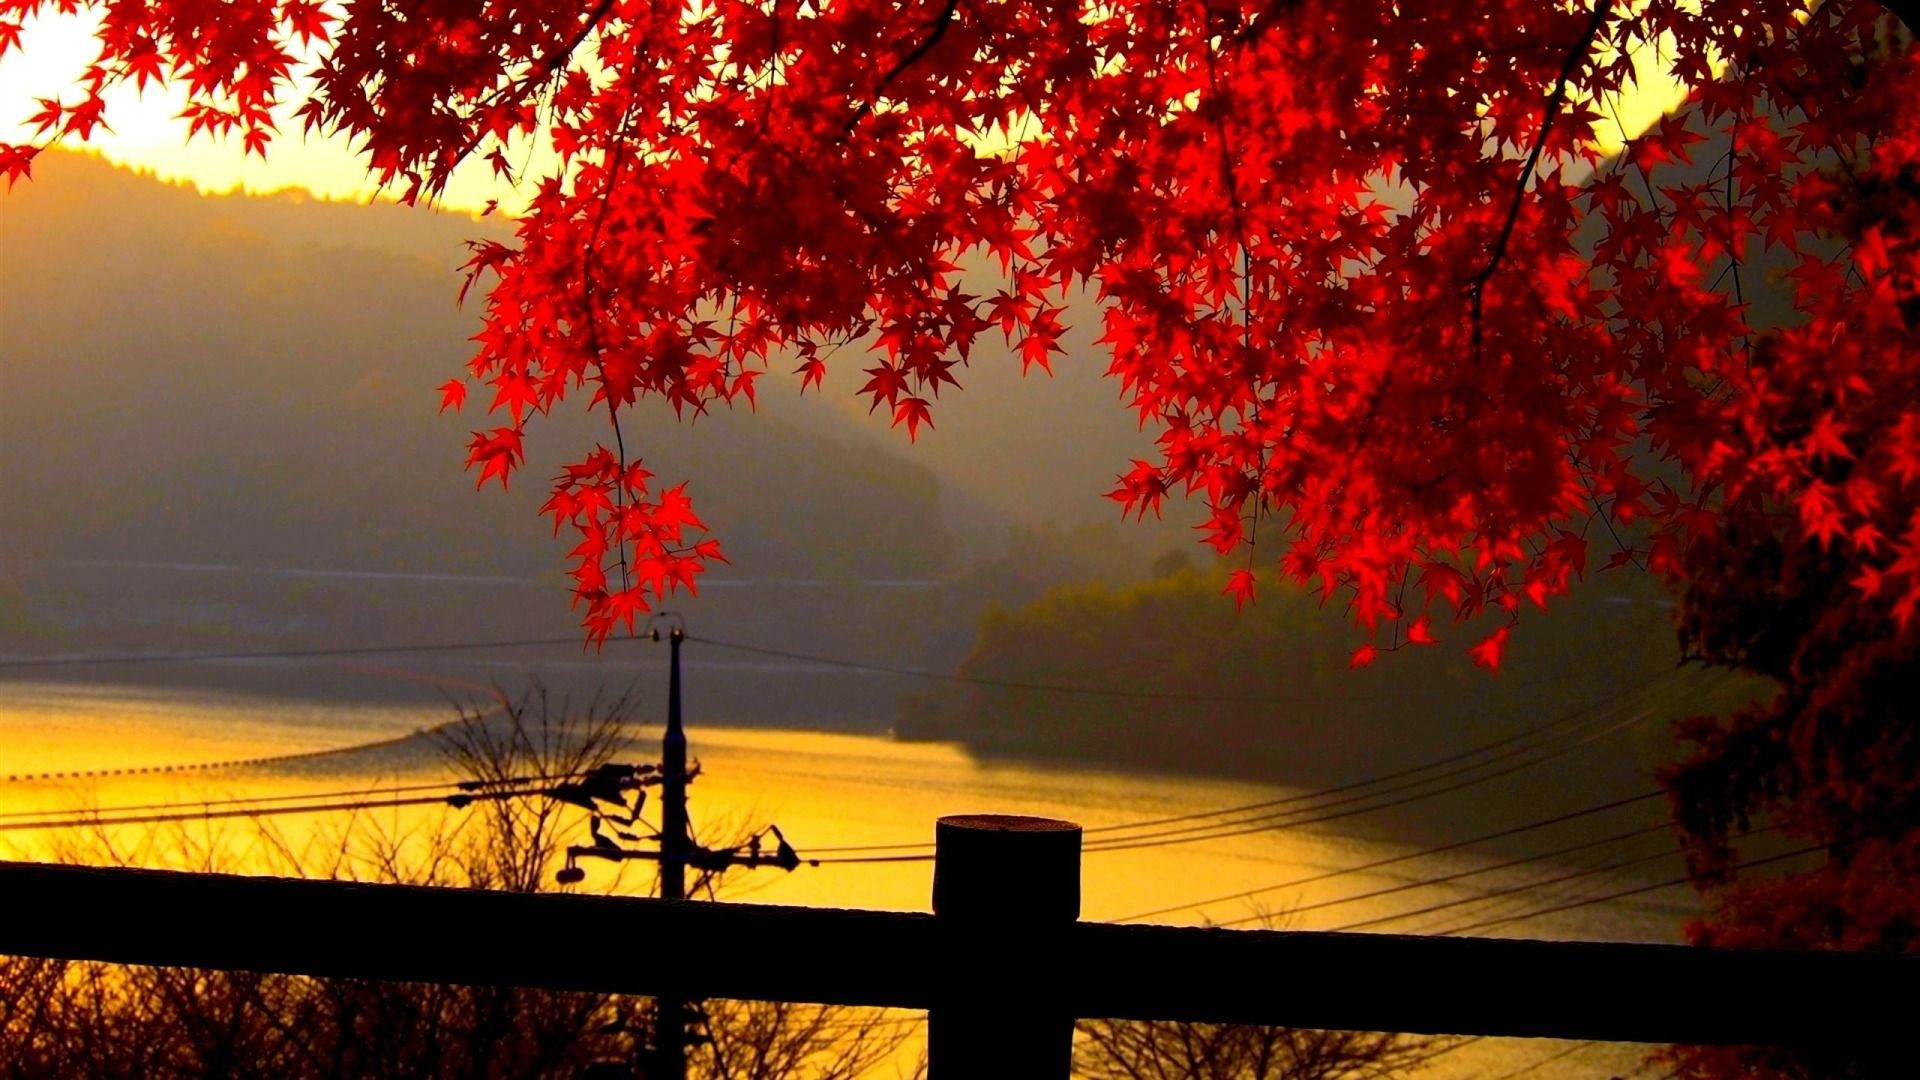 Hd Quality Beautiful Autumn Widescreen Wallpaper 5 Full Size